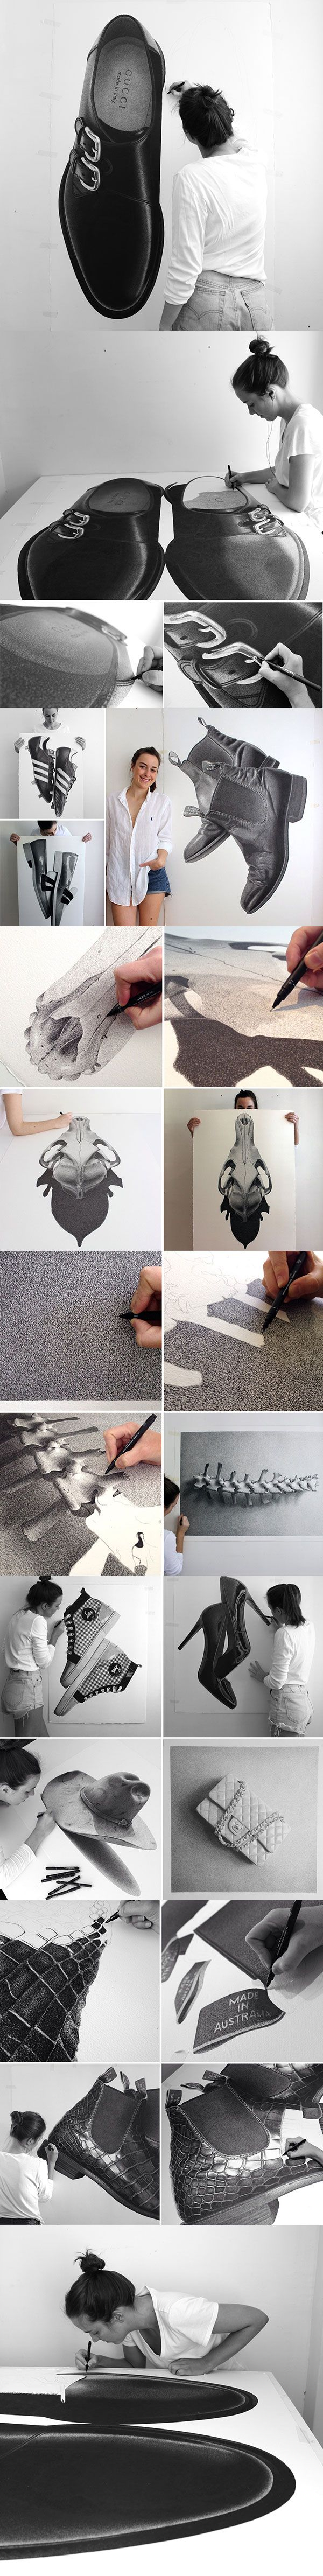 Realistic Drawings B&W   |   cjhendry